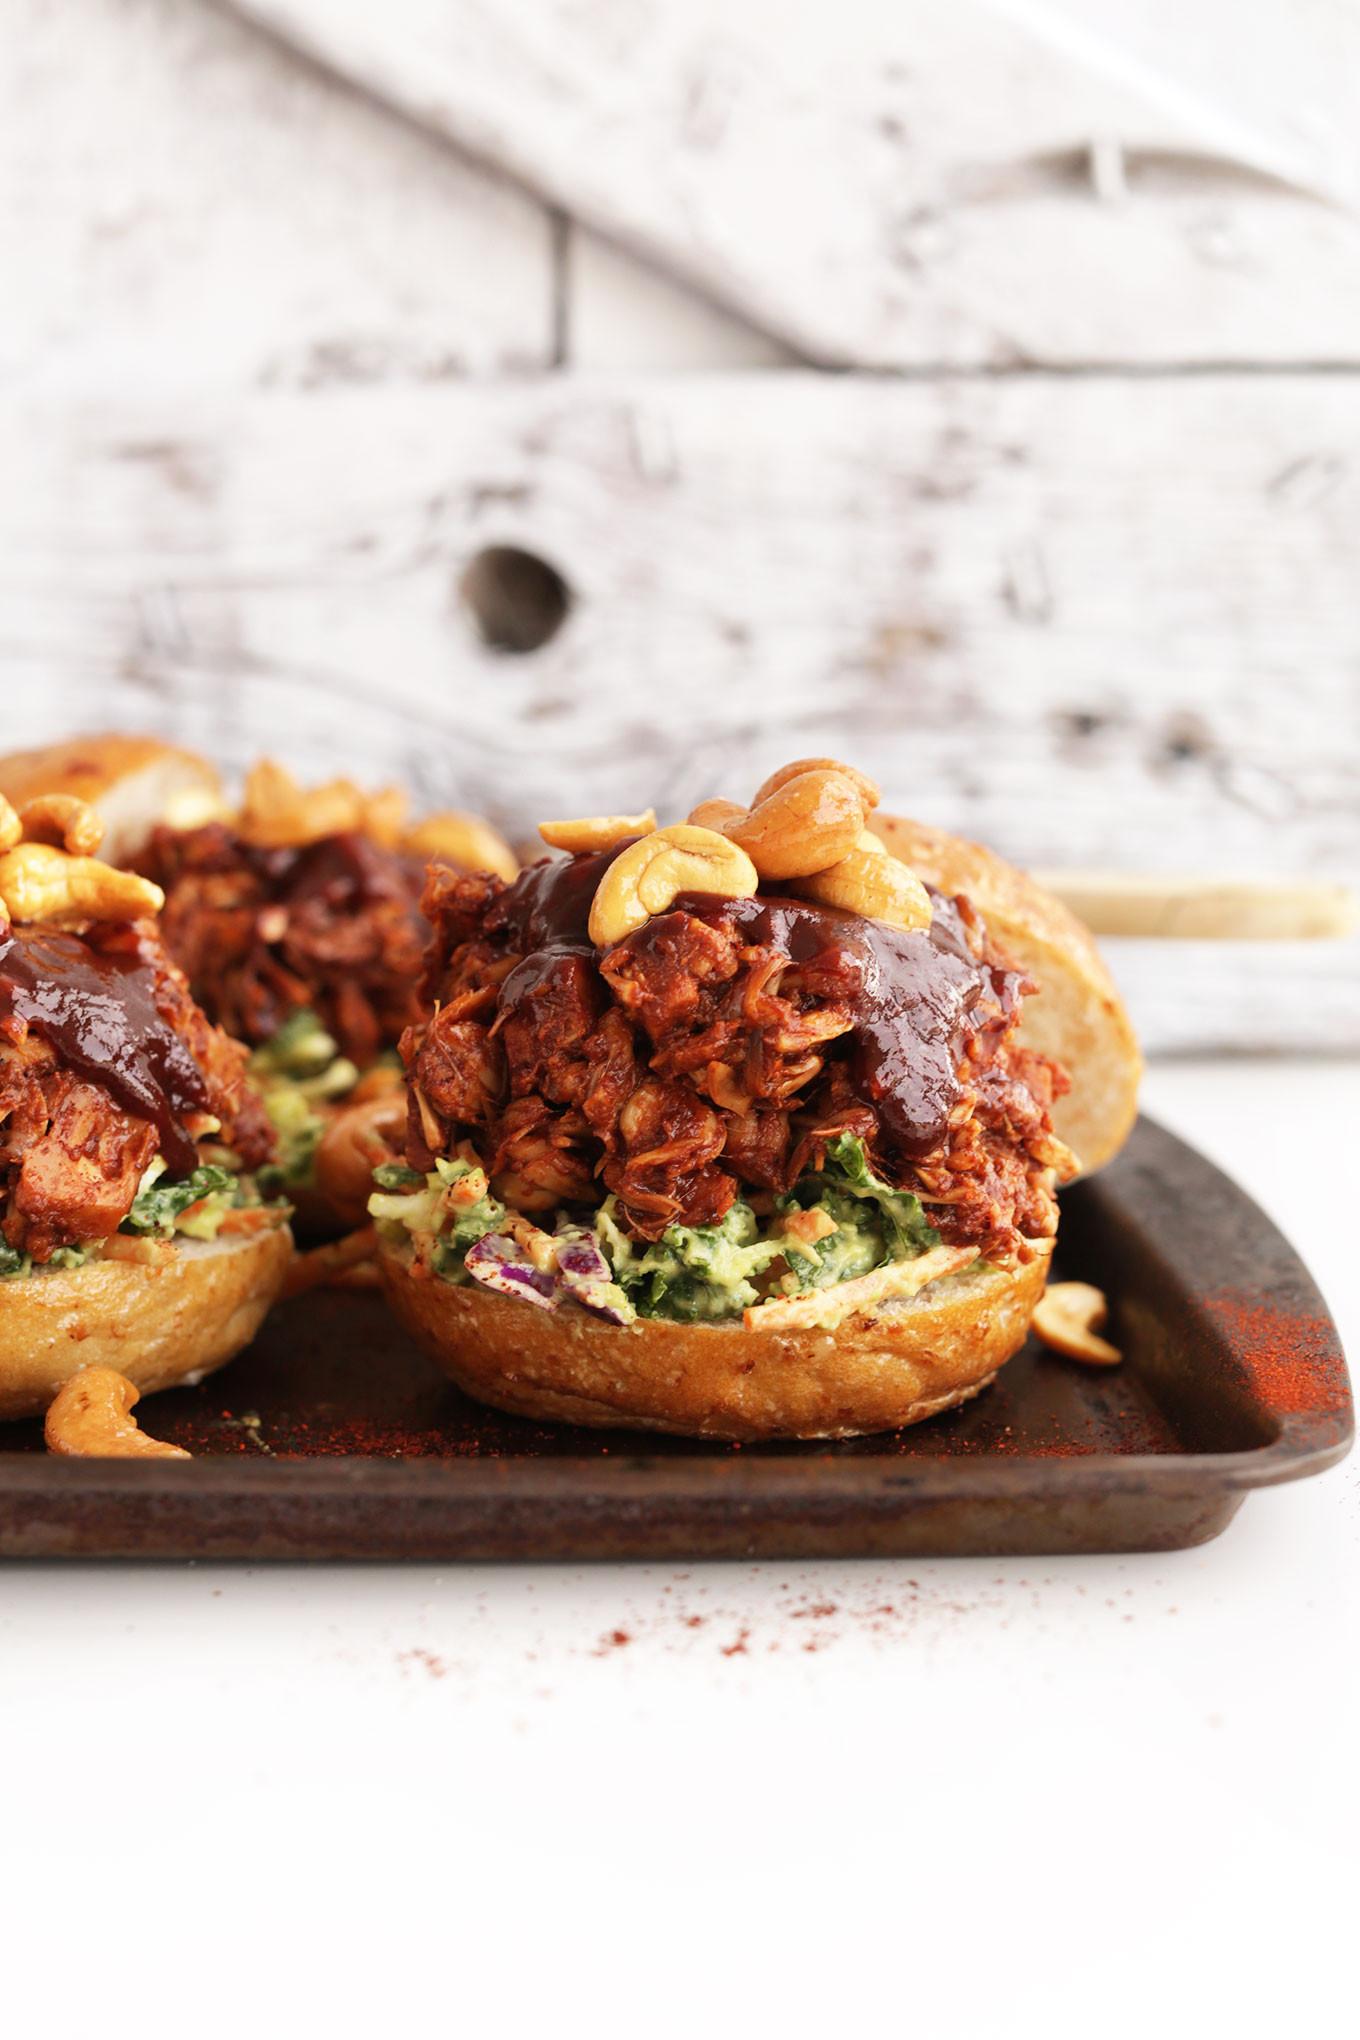 Vegetarian Bbq Recipes  BBQ Jackfruit Sandwiches